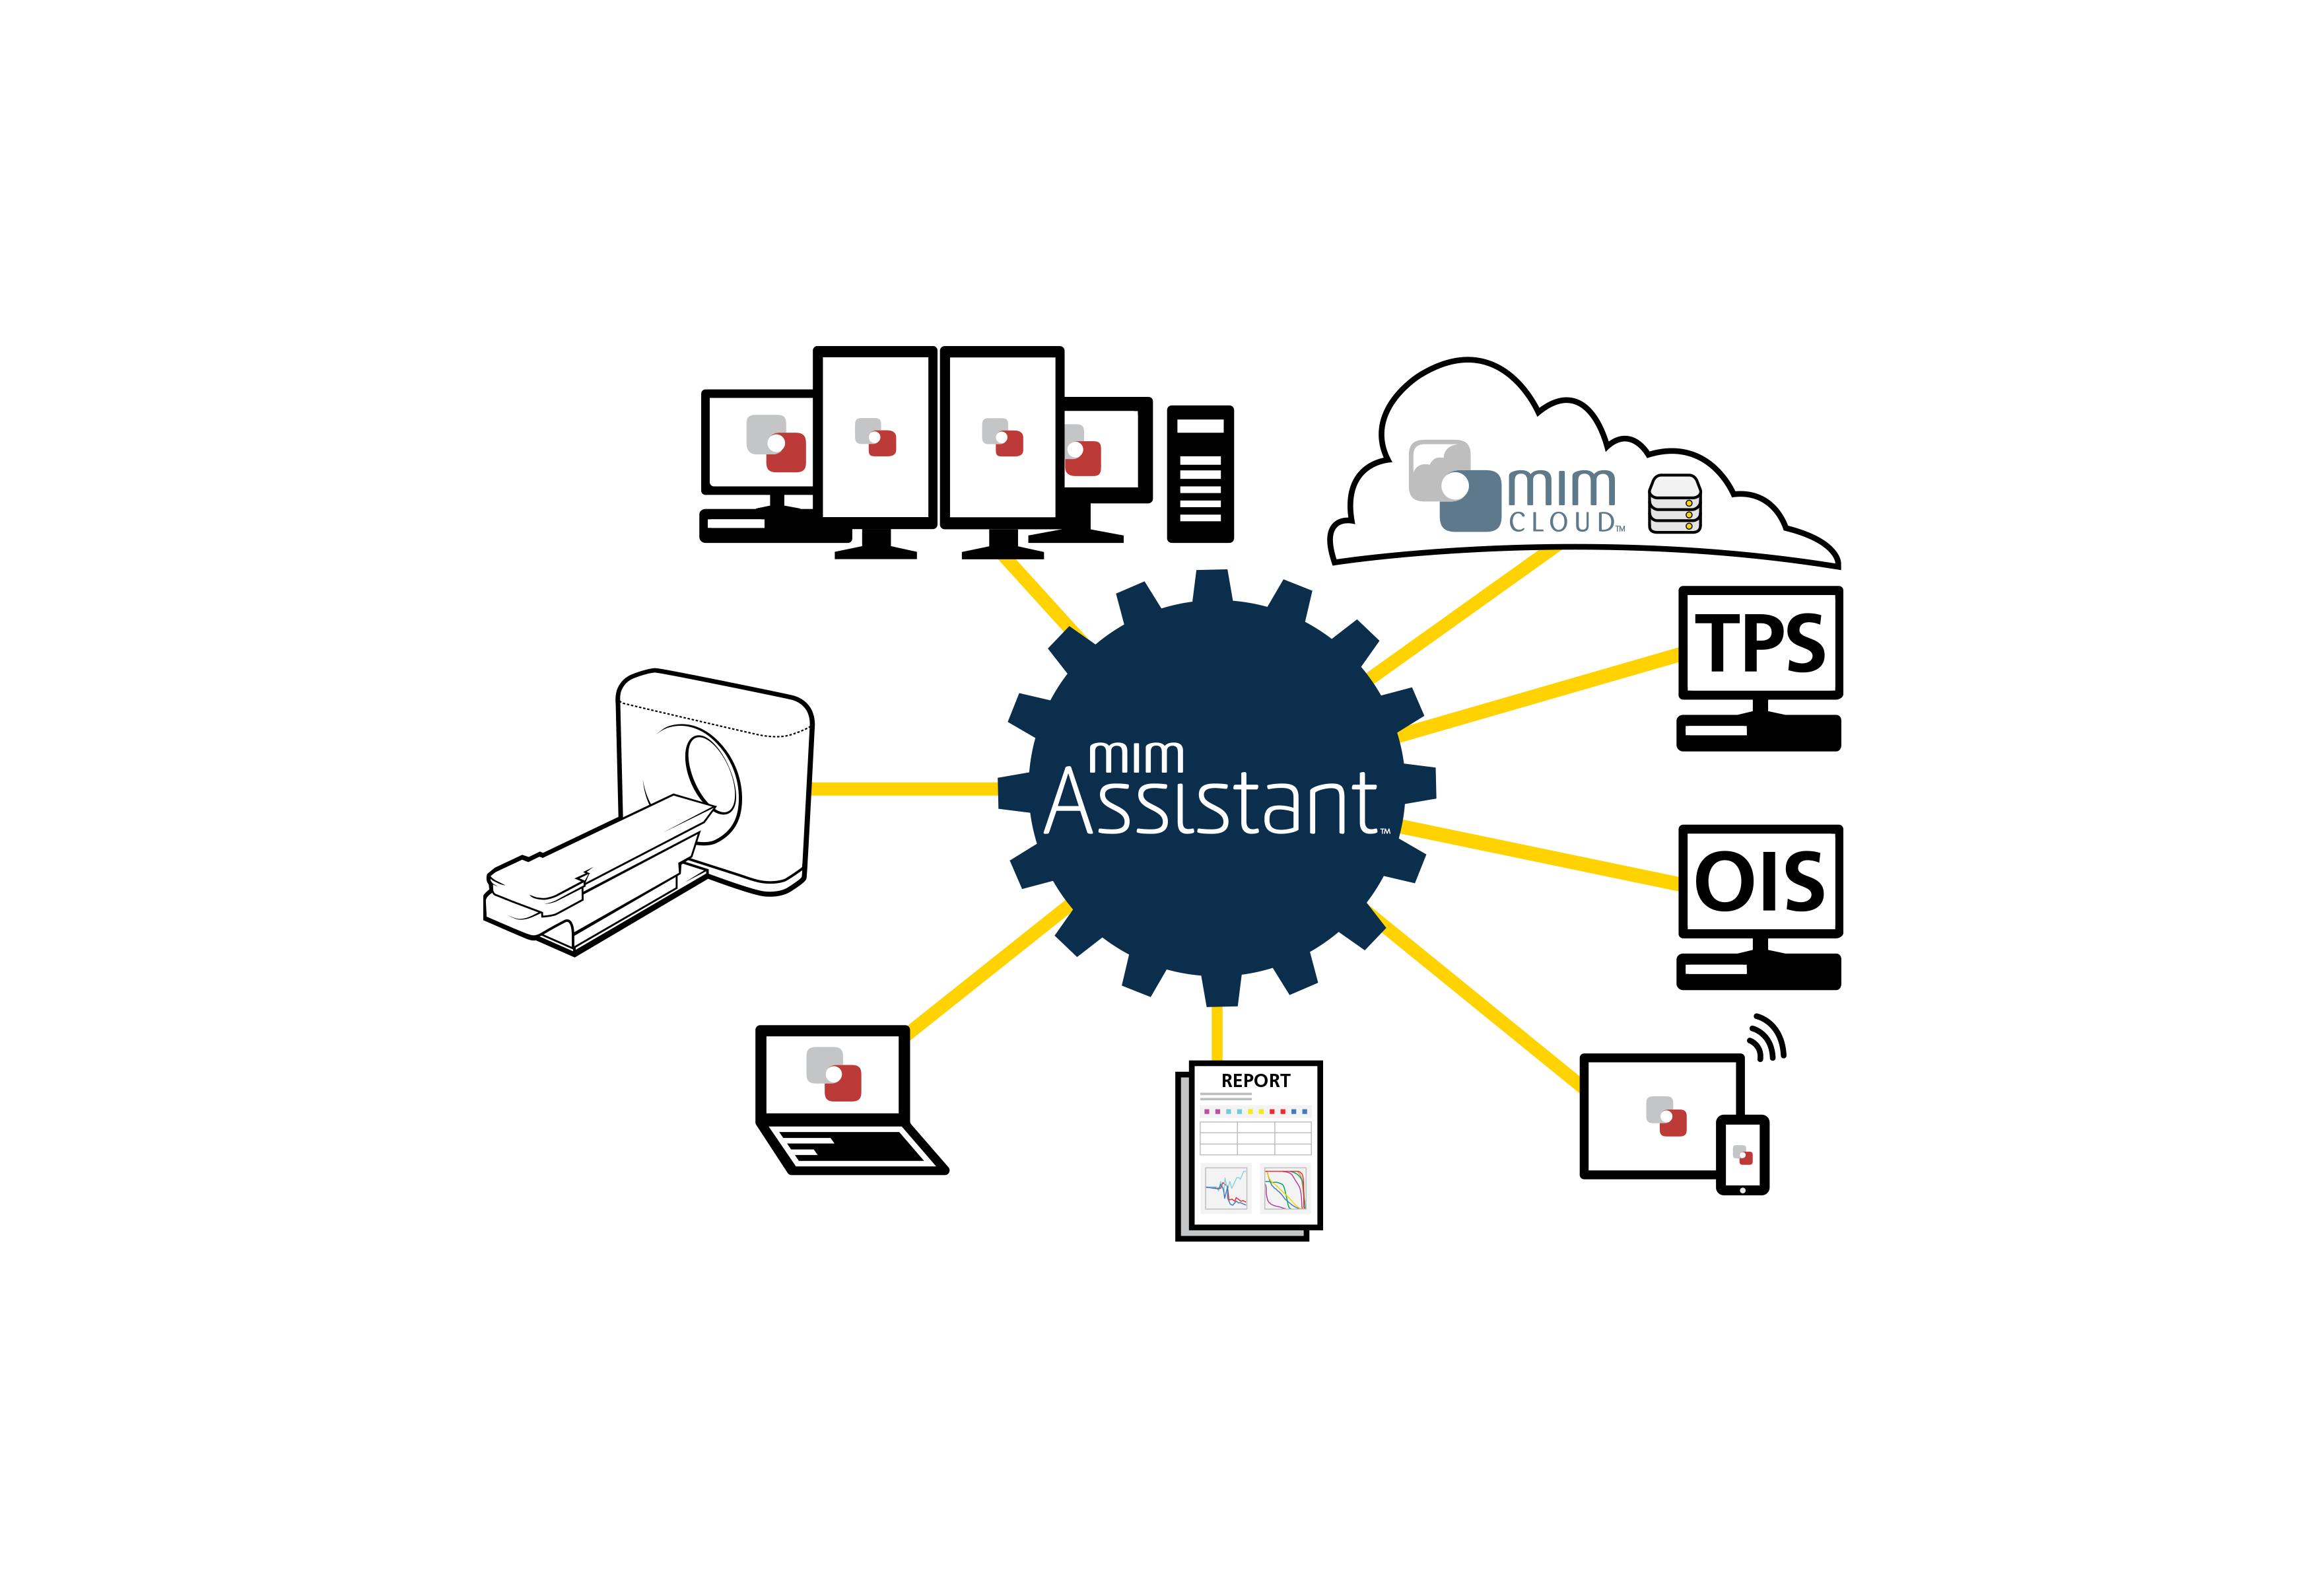 MIM_Assistant_2x.png